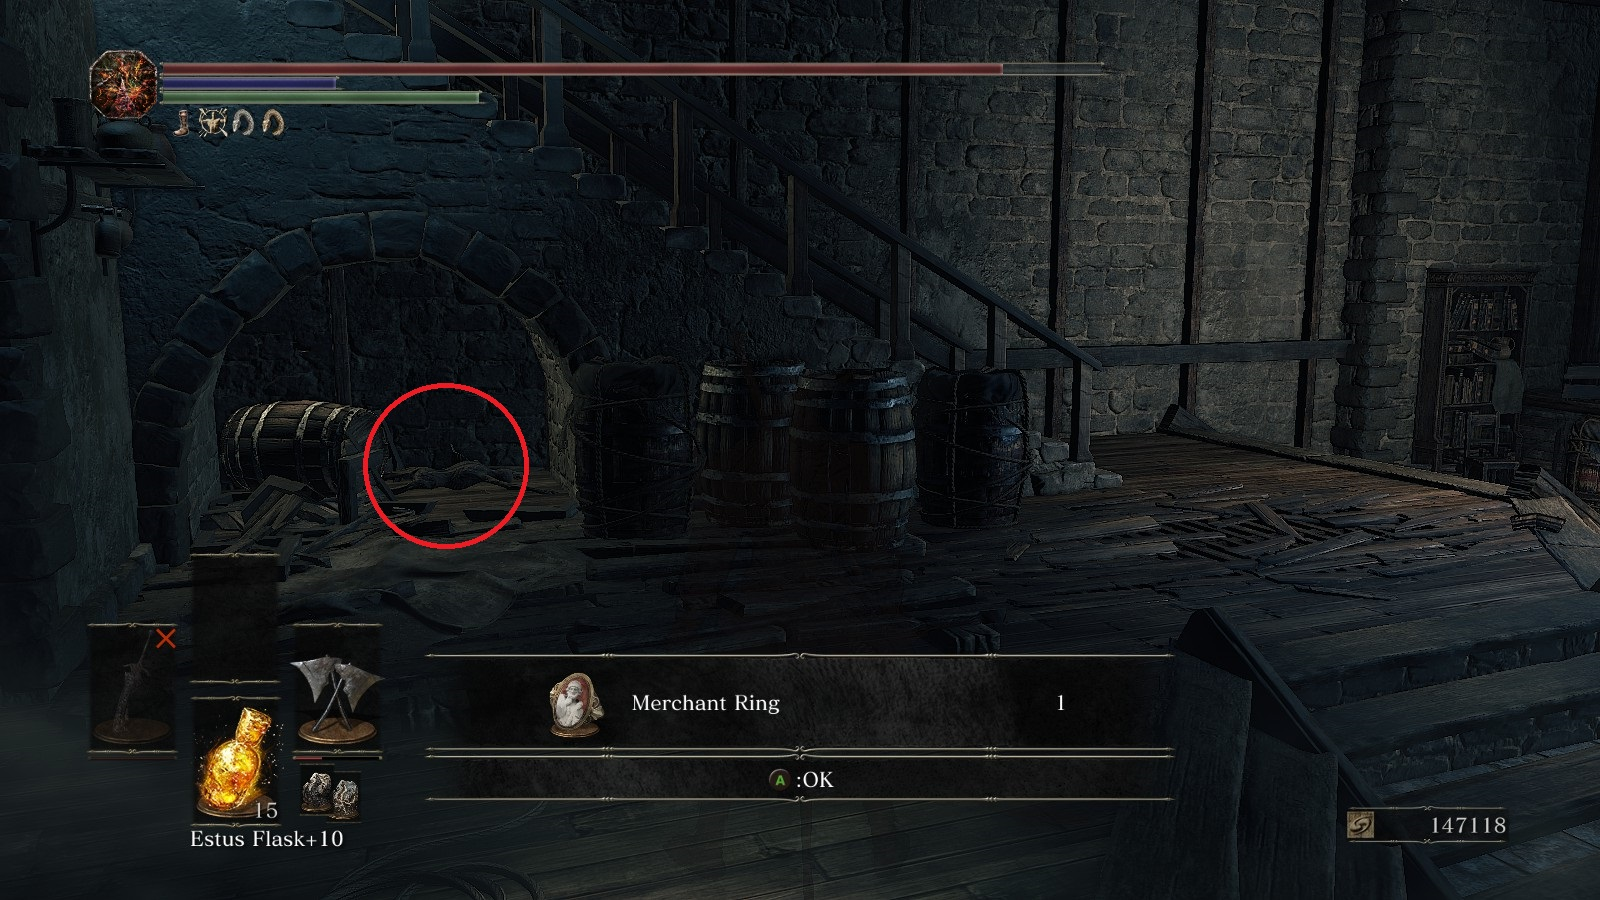 merchant-ring.jpg